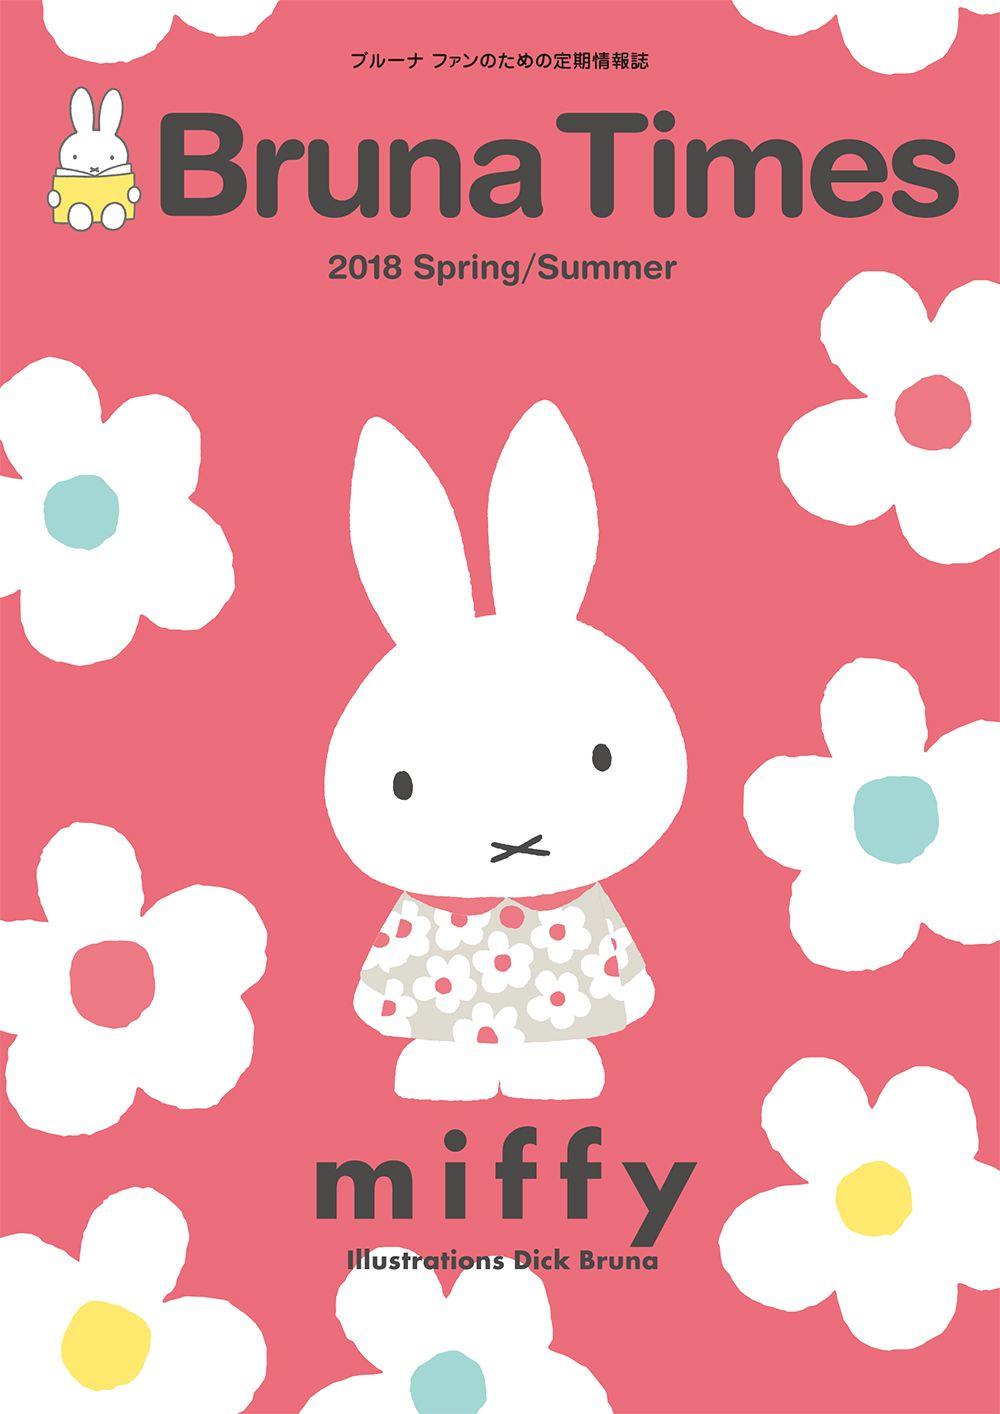 Bruna Times 2018 Spring Summer号 トピックス 花 イラスト